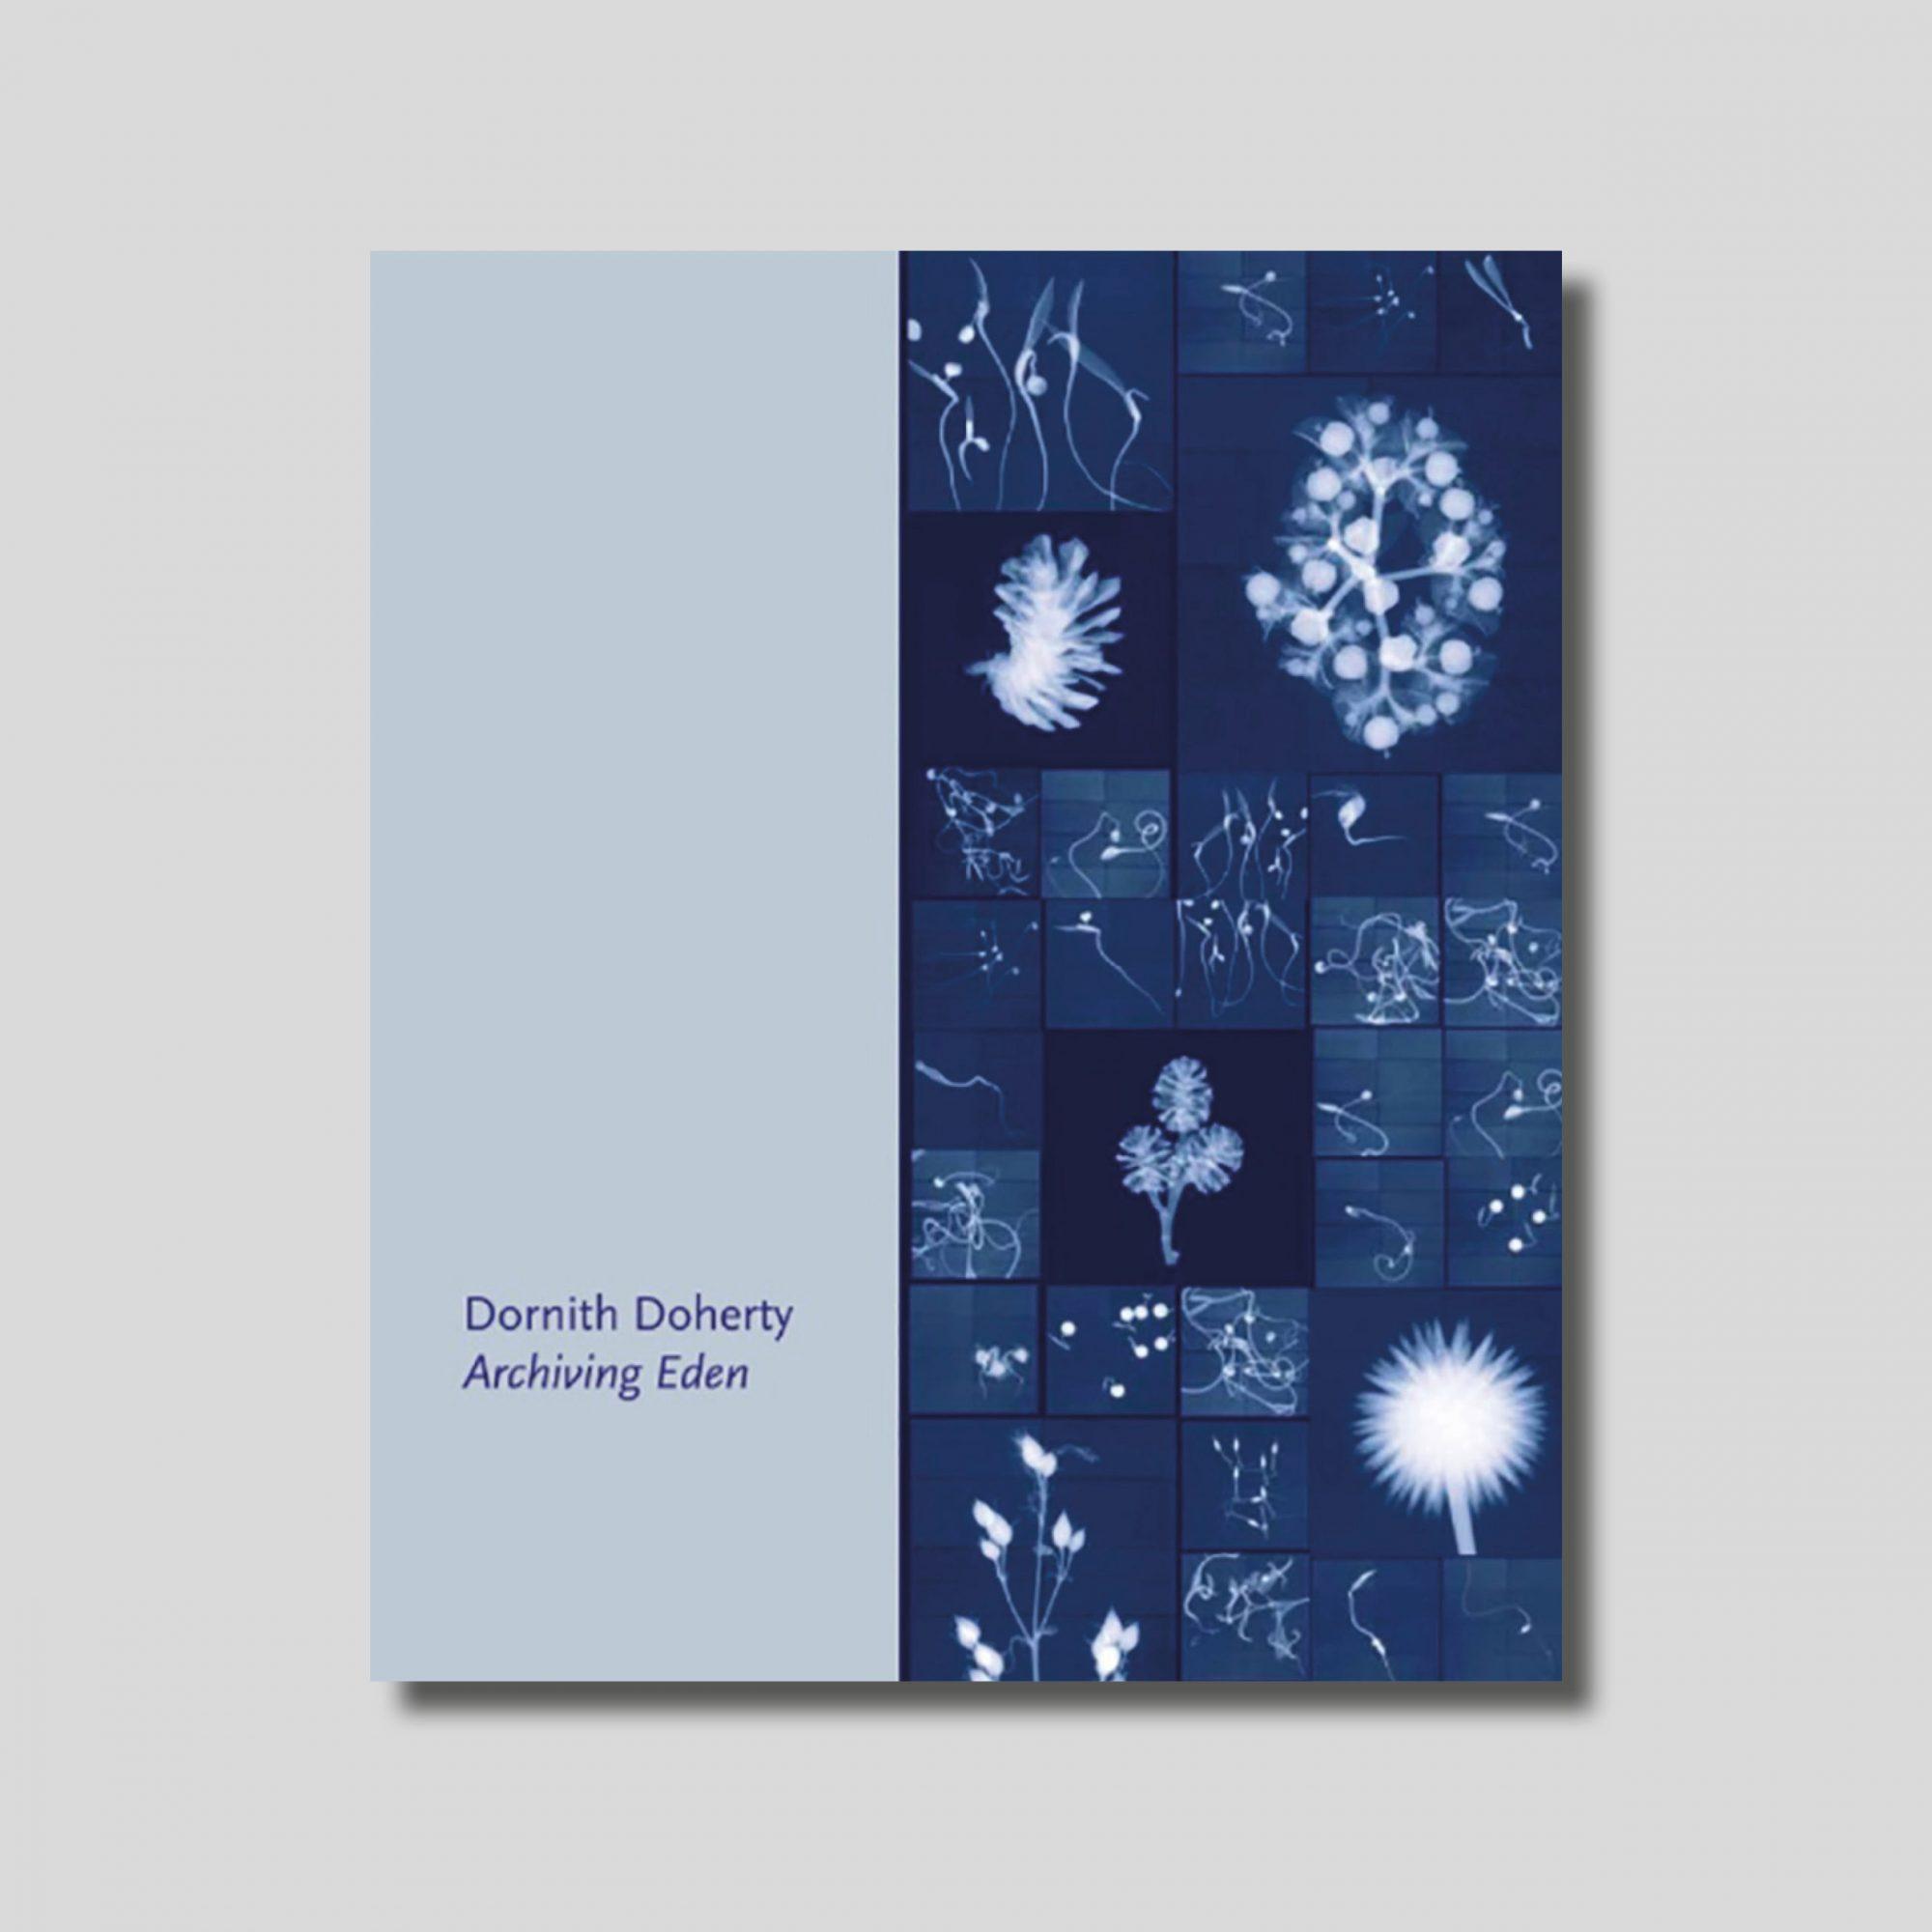 Dornith Doherty book cover